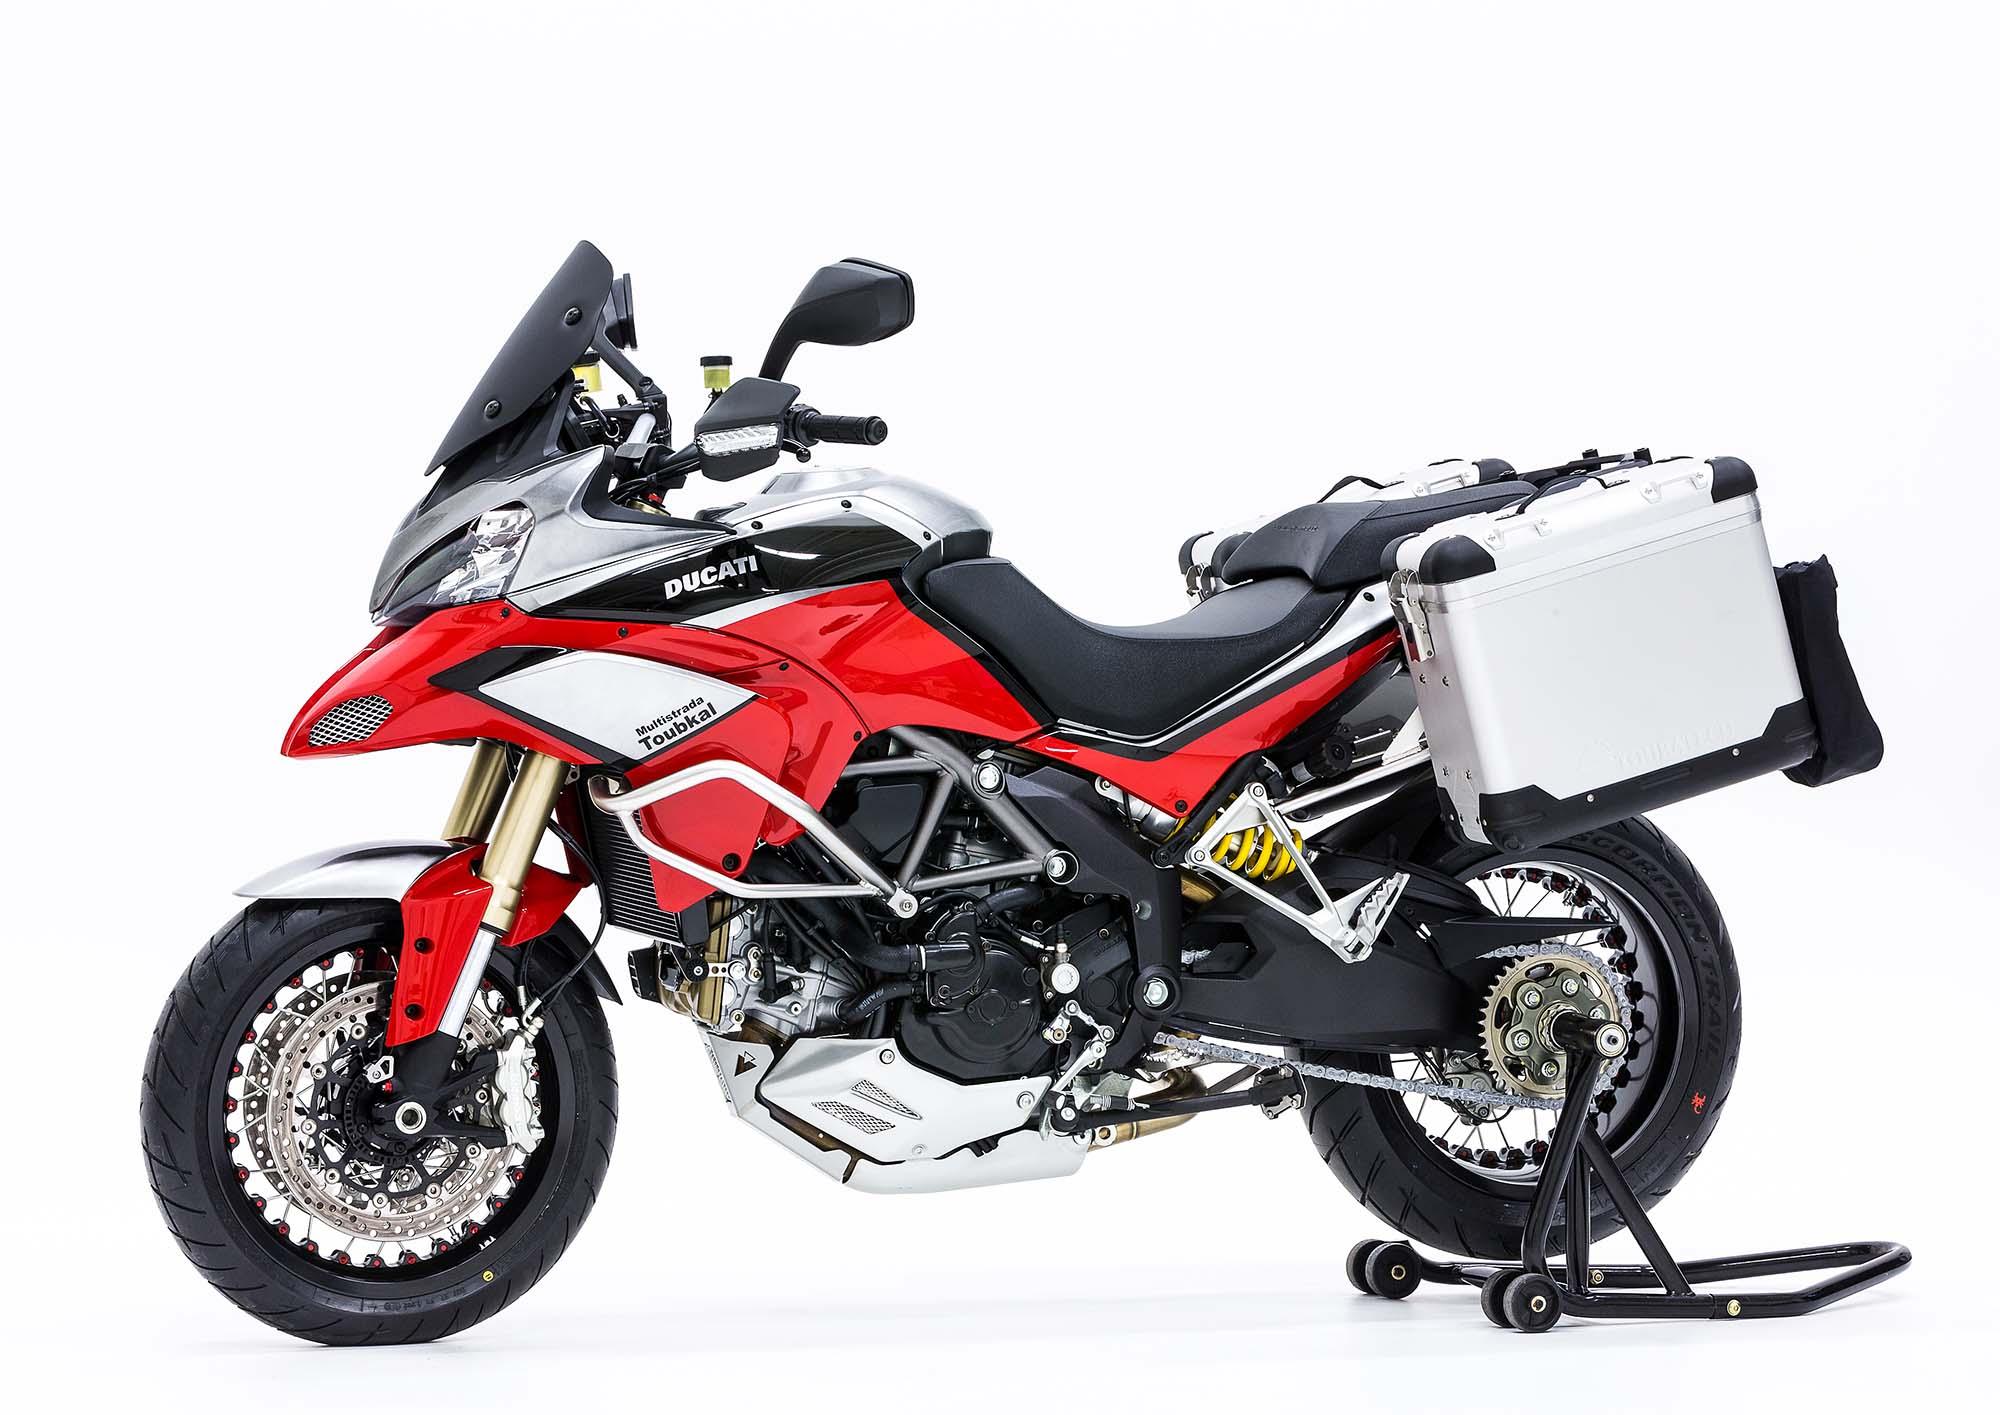 Ducati Multistrada 1200 Toubkal A Good Design Lesson For